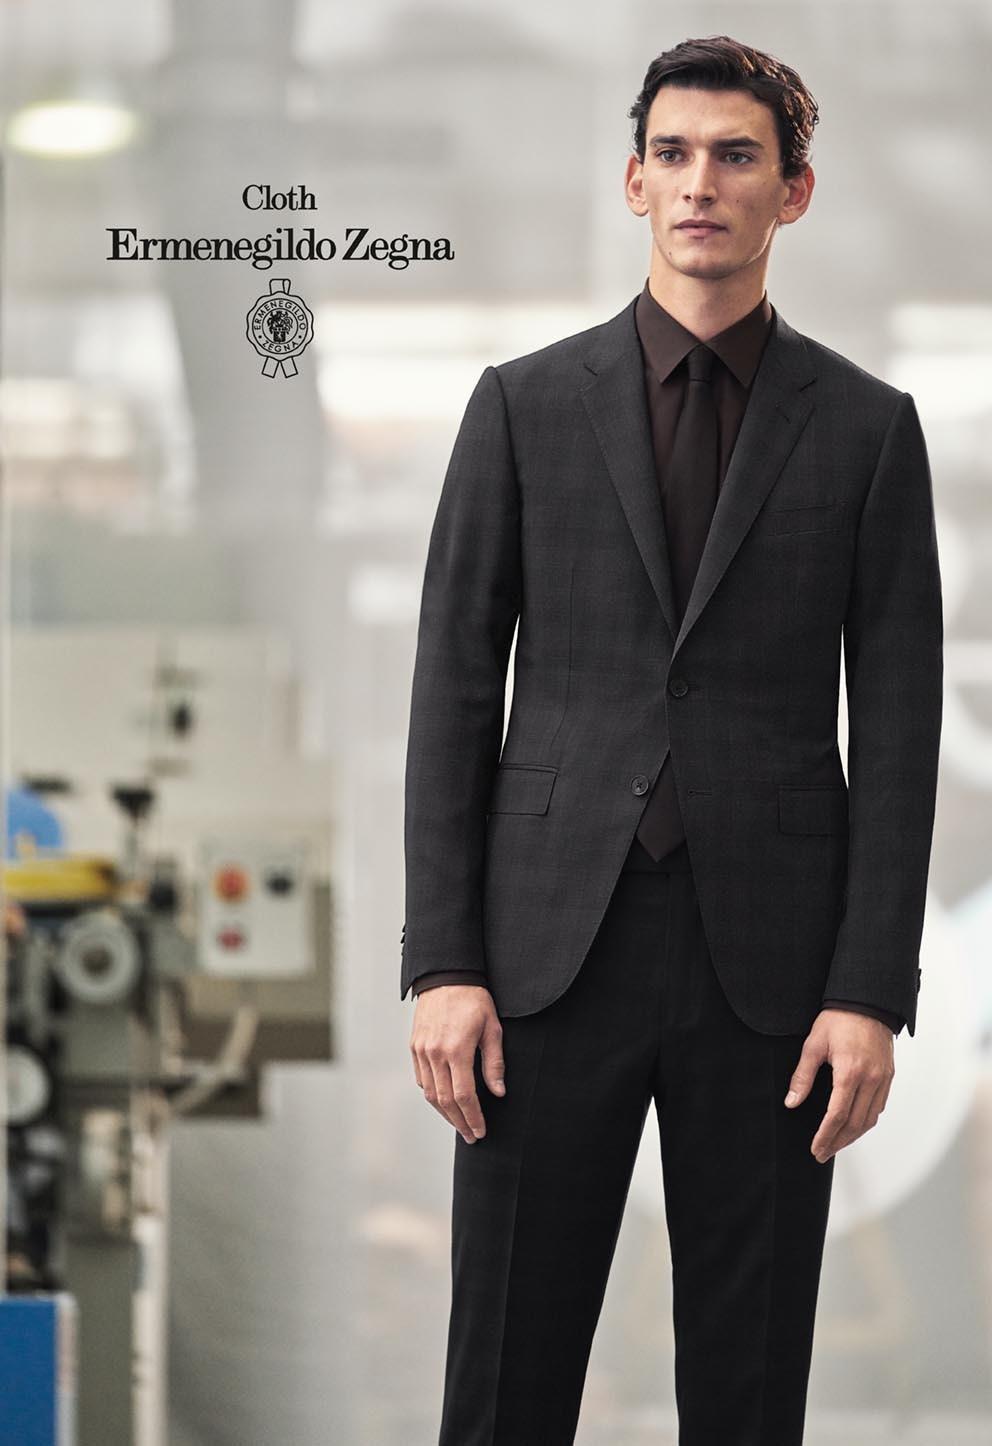 Zegna Anteprima Ss21 27